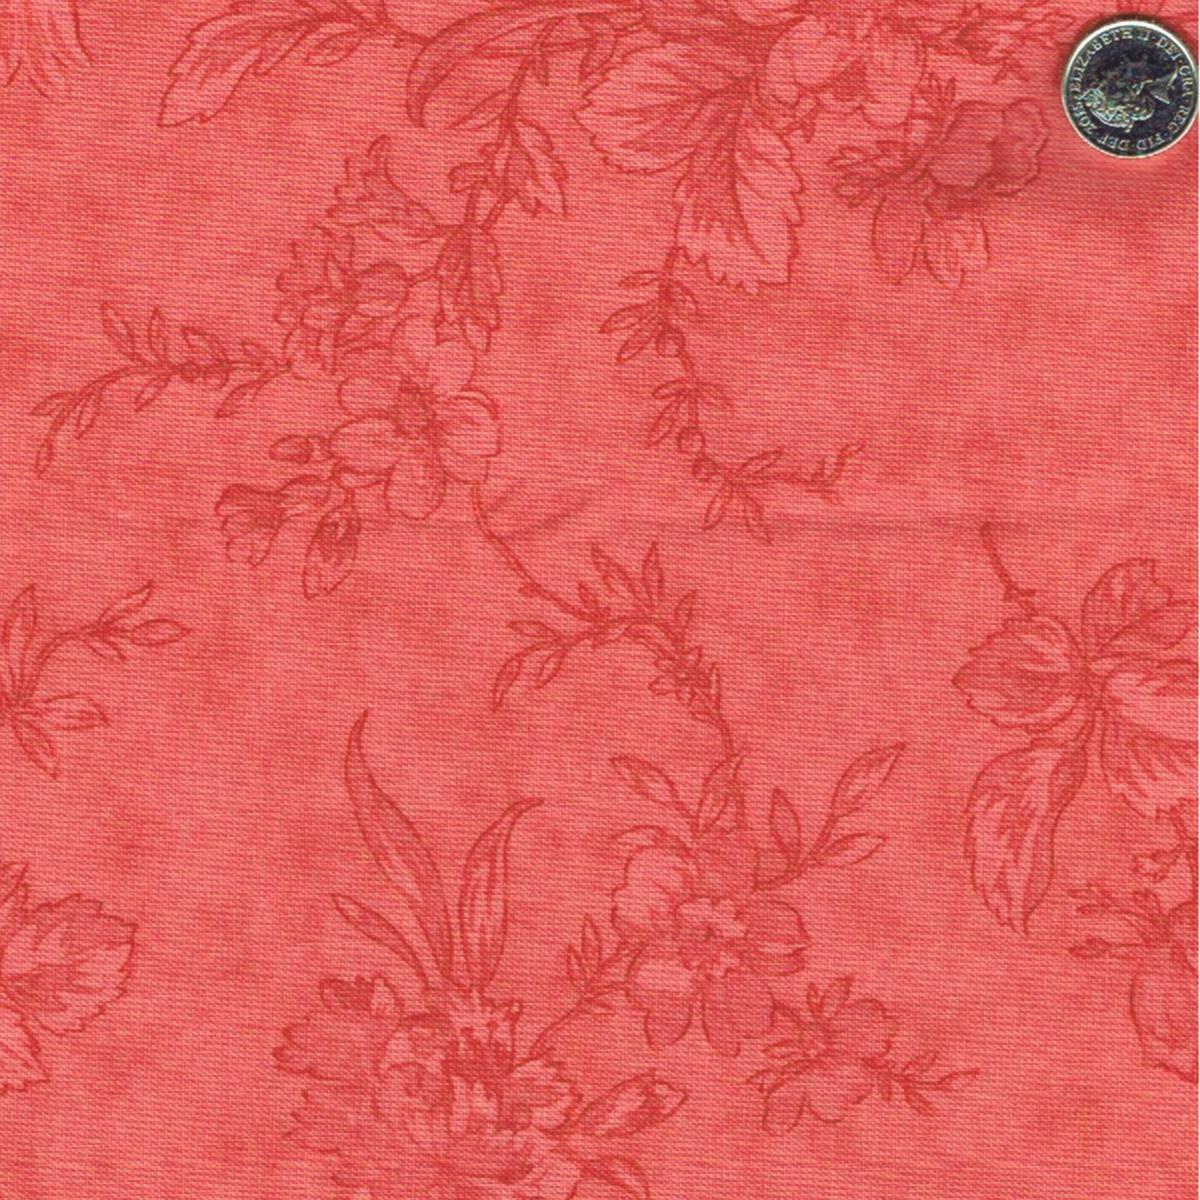 Poetry Prints Tonal Blooms Rose 44130 - 26